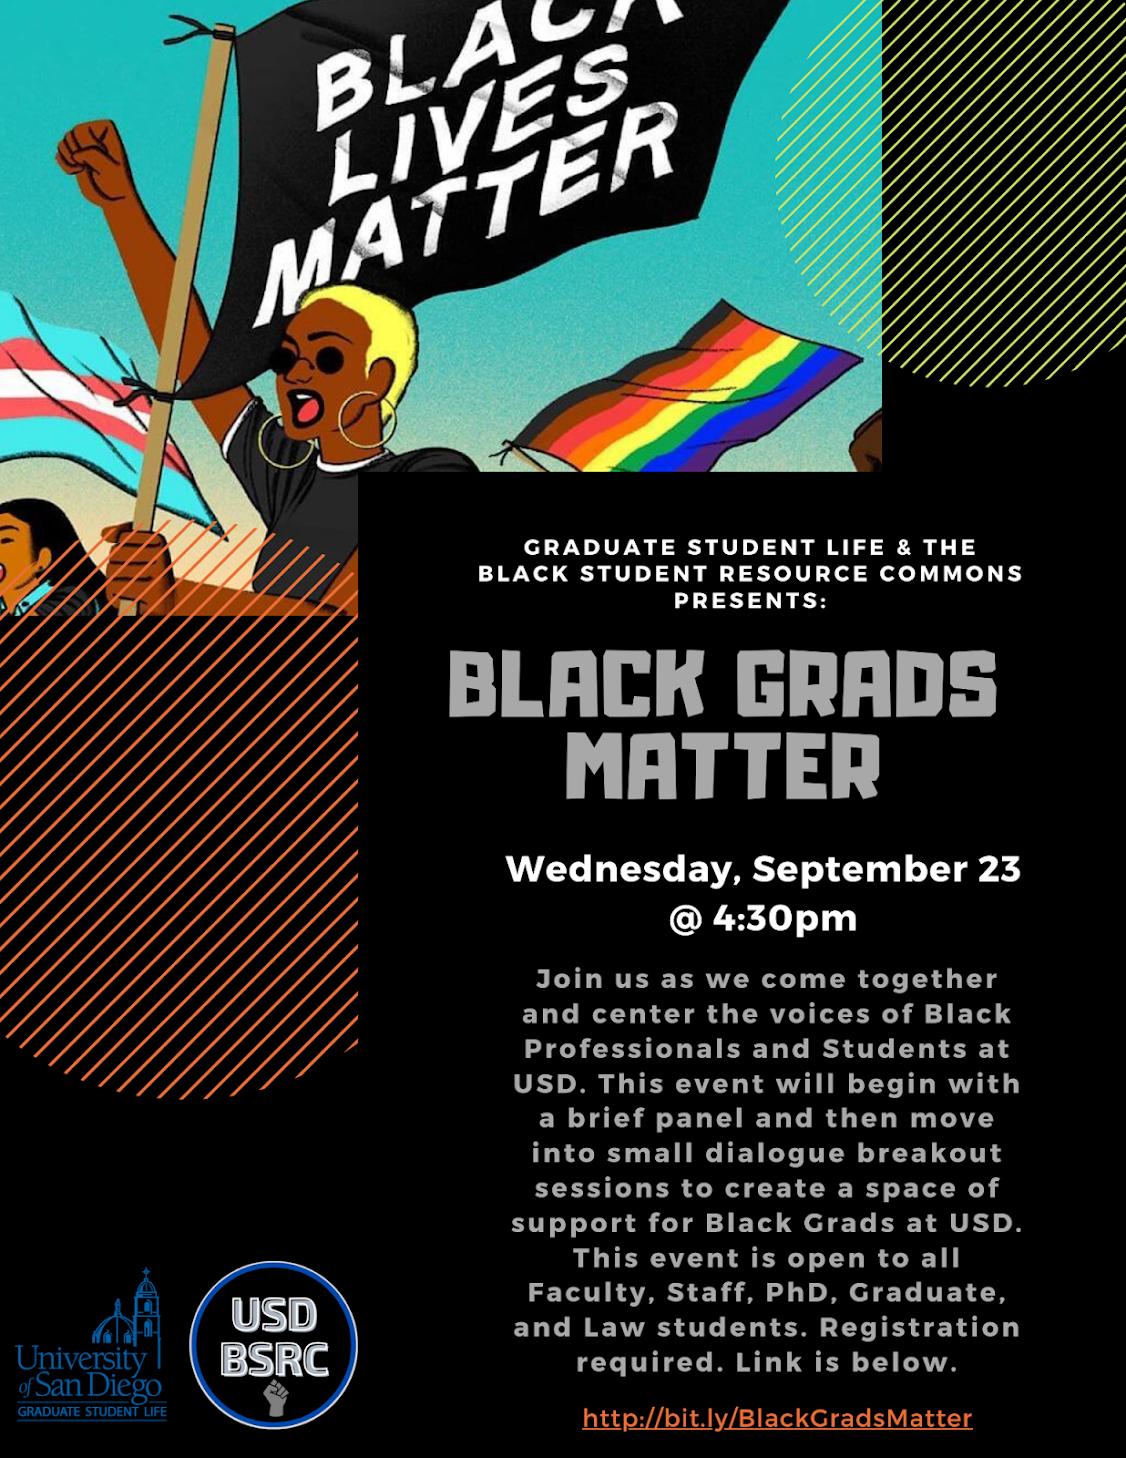 Black Grads Matter, Wednesday, Sept 23 at 4:30pm